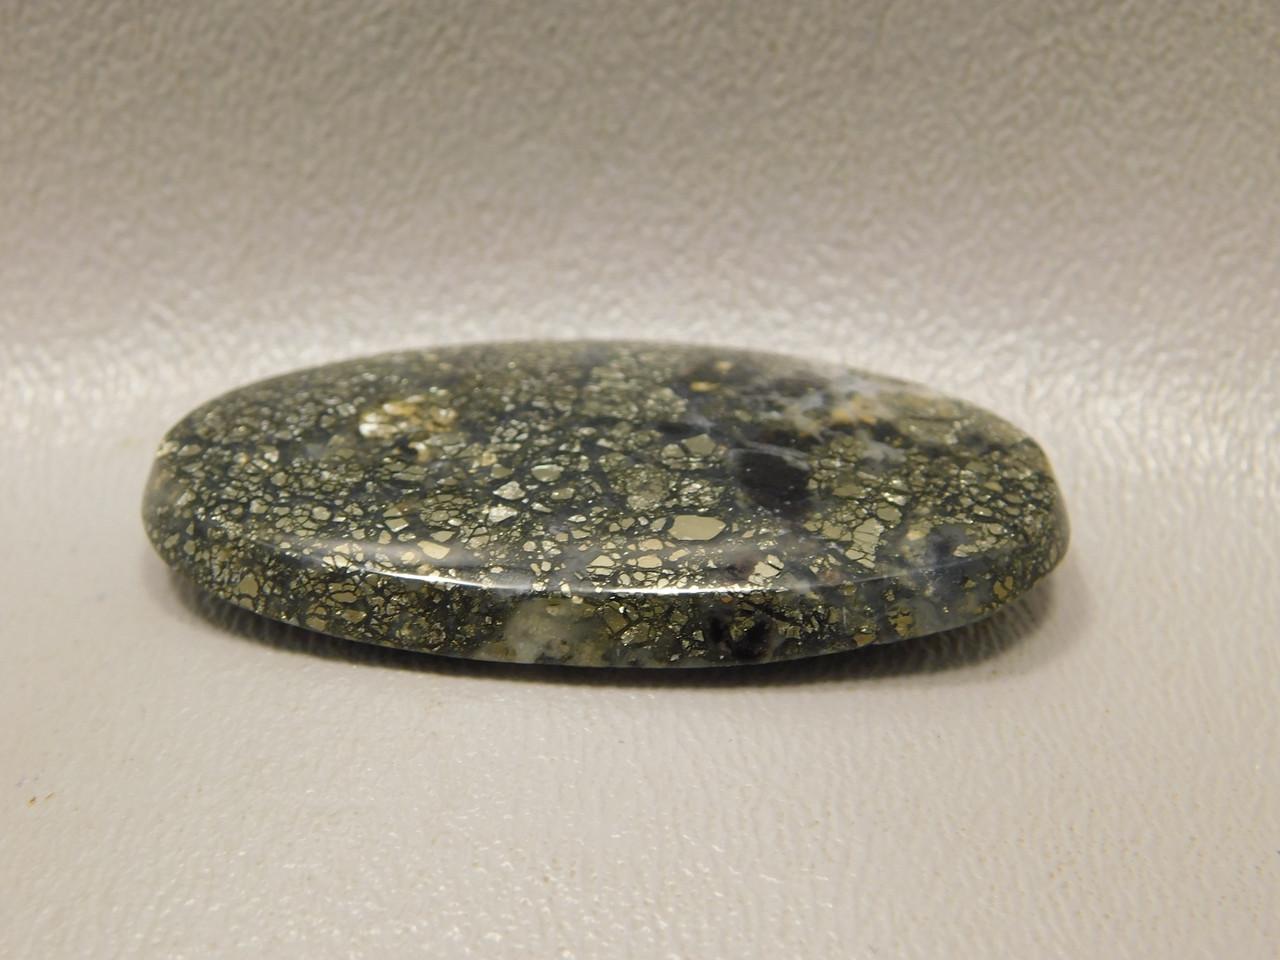 Stone Cabochon Pyrite Agate Designer Semi Precious Gemstone #16